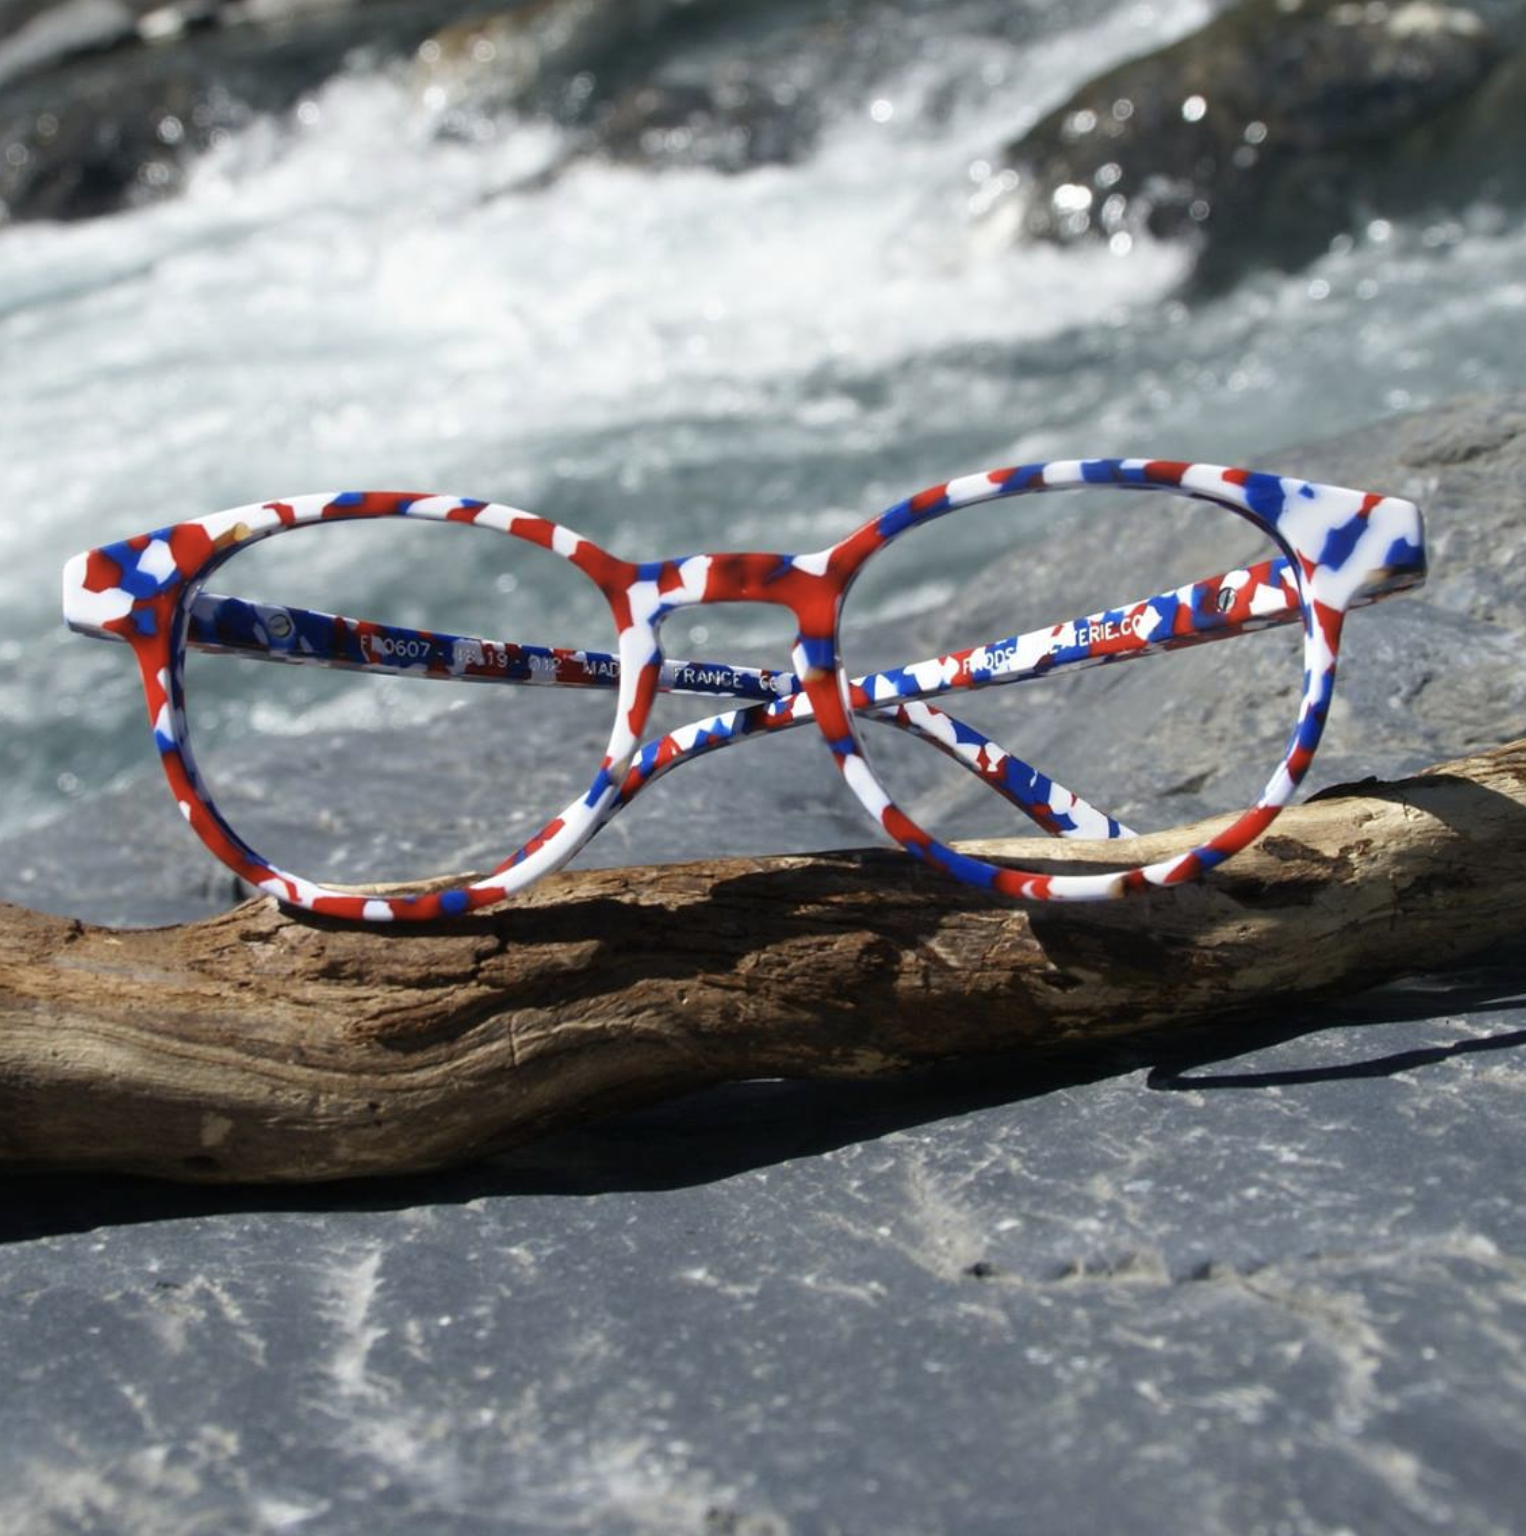 FROD'S lunetterie